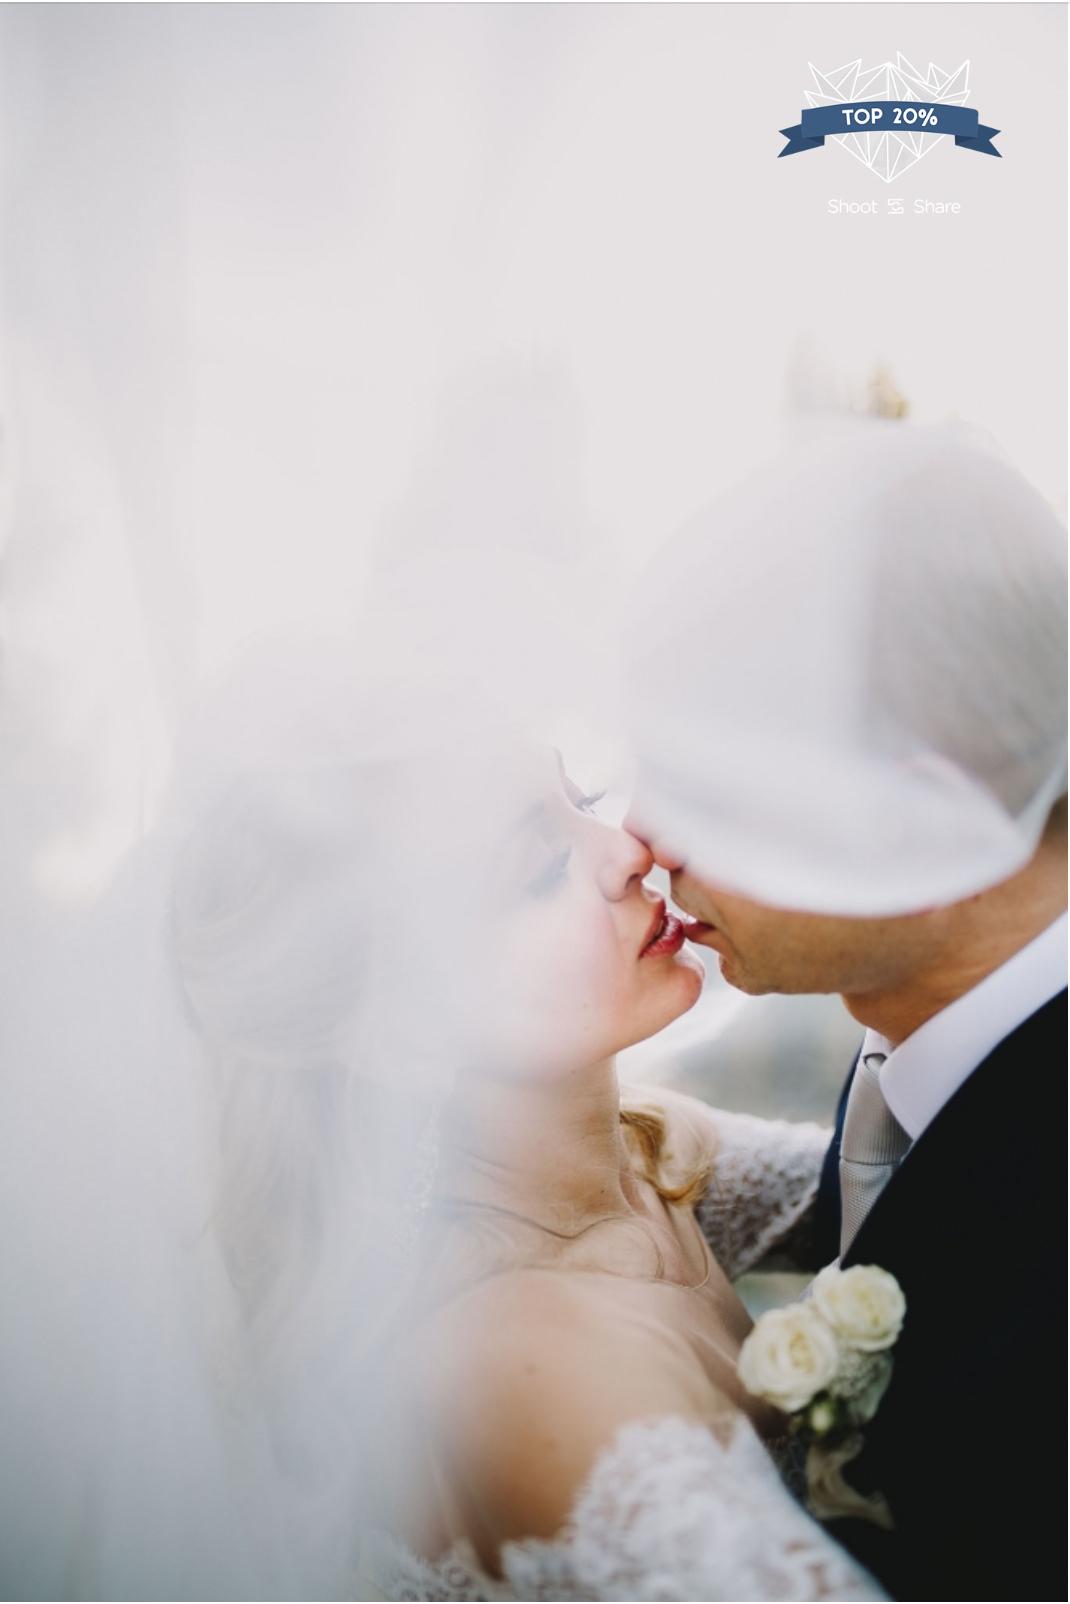 Archer Inspired Photography Shoot and Share Family Wedding Lifestyle Photographer Morgan Hill California San Francisco Bay Area-8.jpg